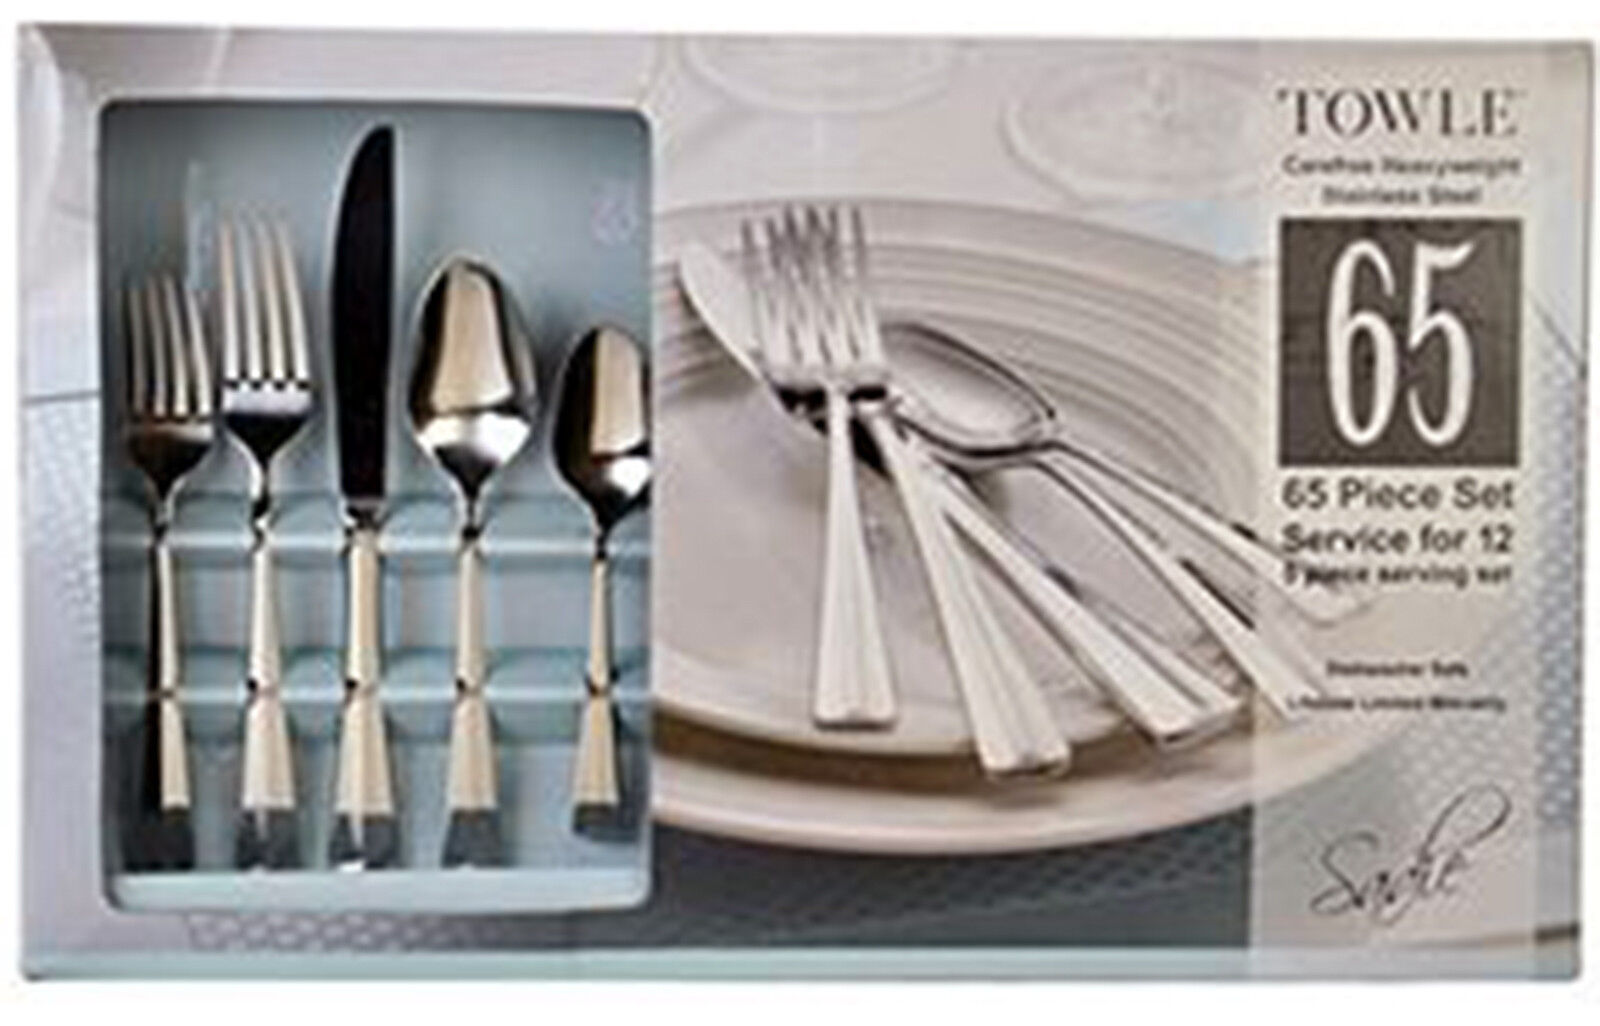 sadie pattern dinnerware 65 piece stainless flatware